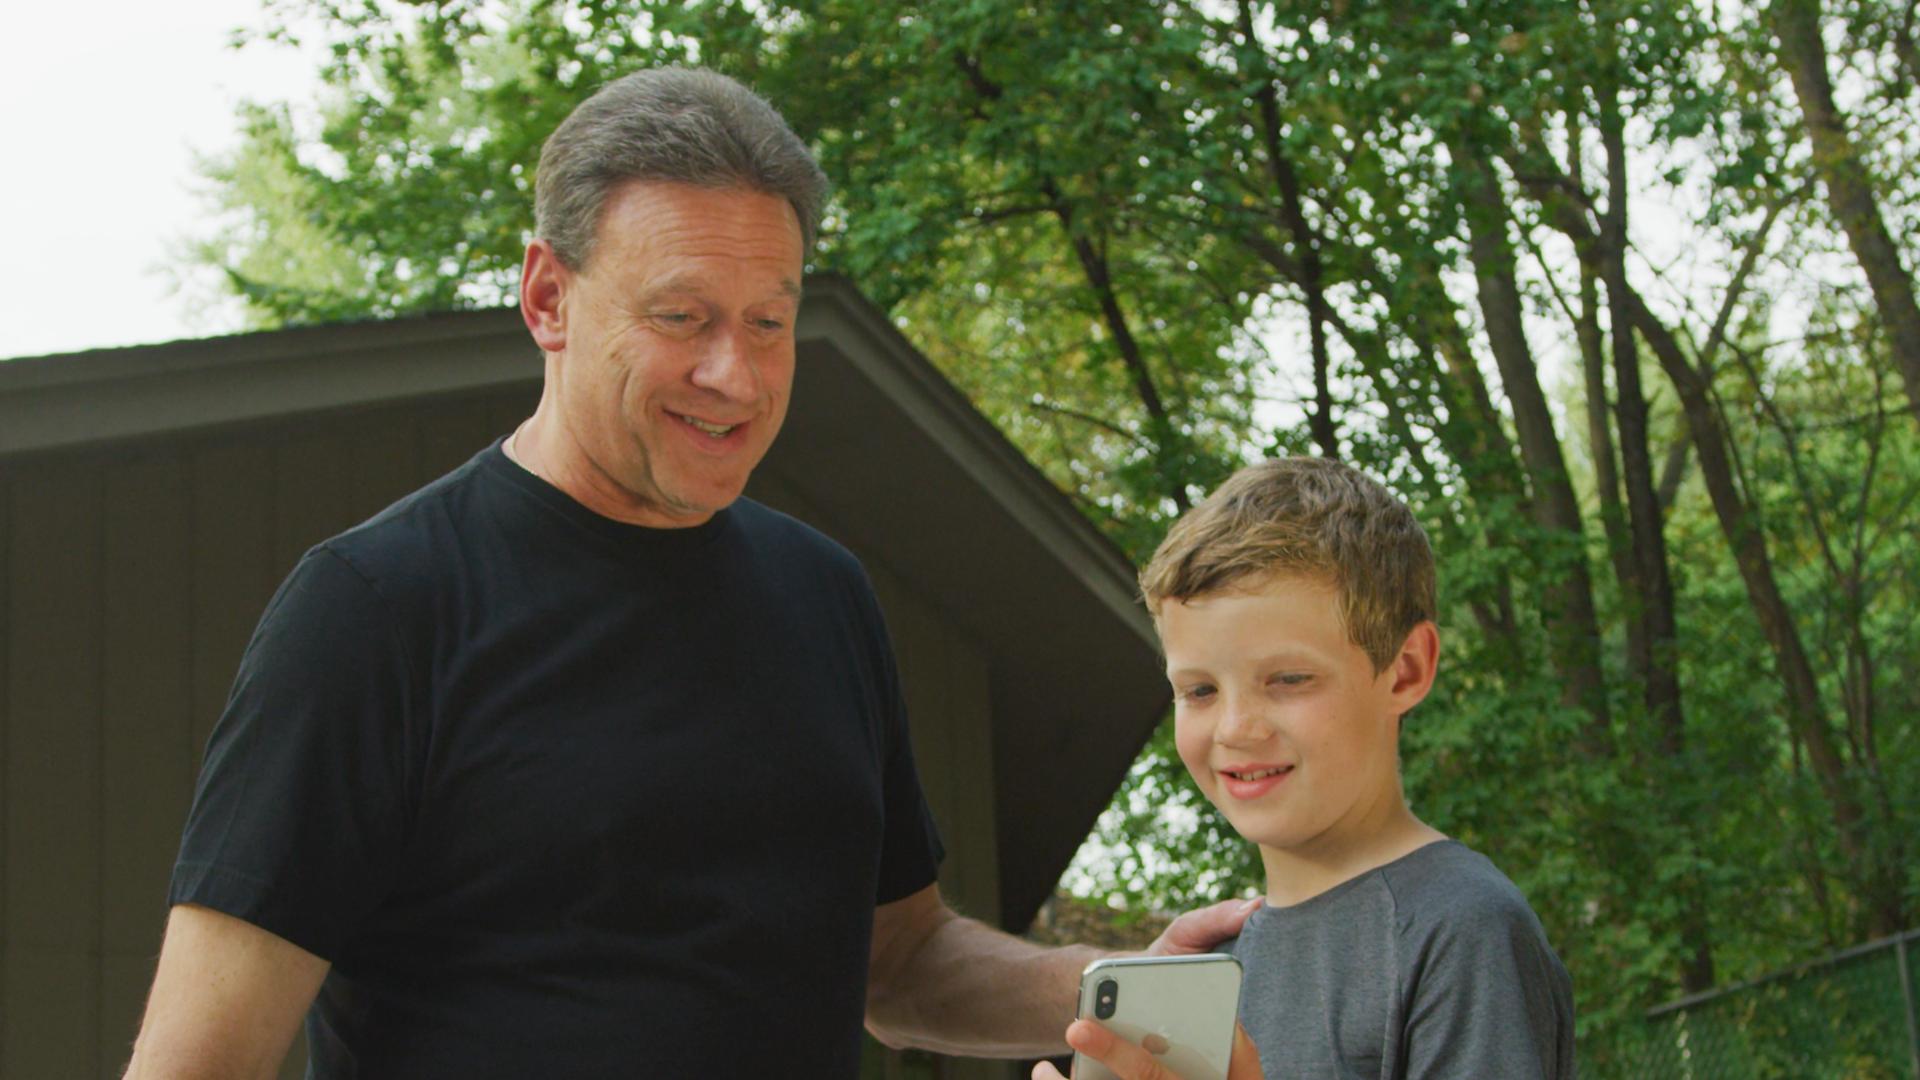 Top 3 Reasons Parents Love Dr. Dish